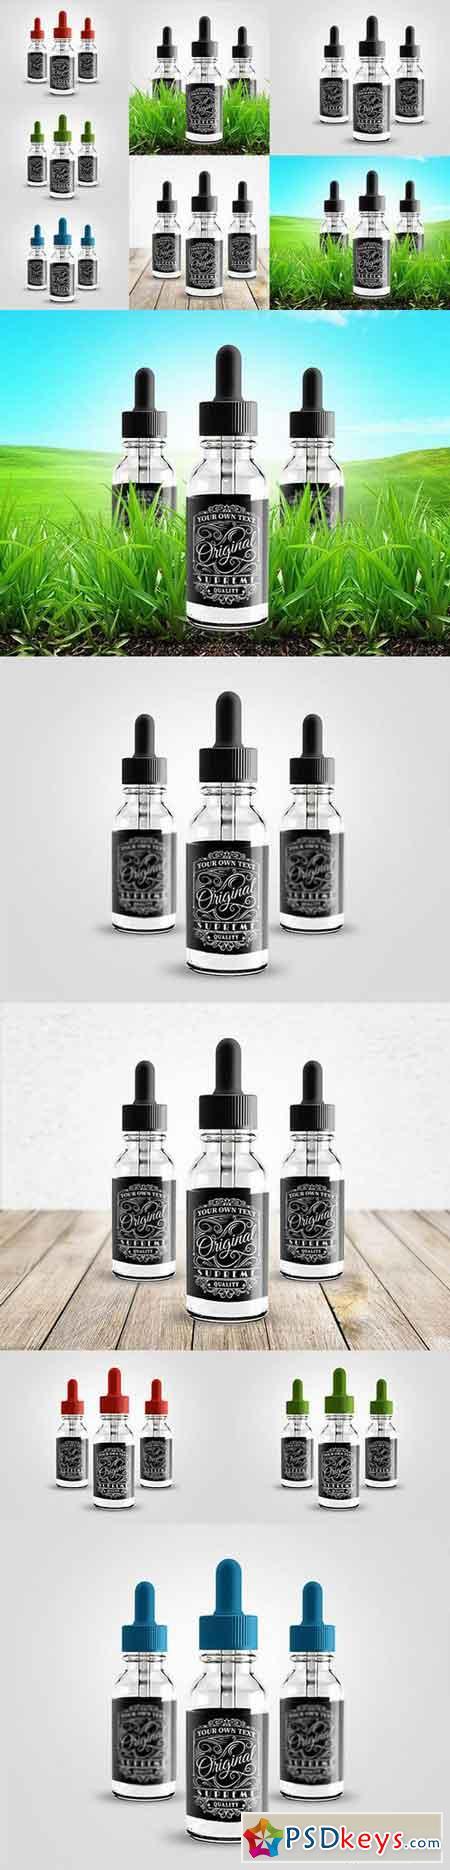 Liquid Bottle Label Mockup 763861